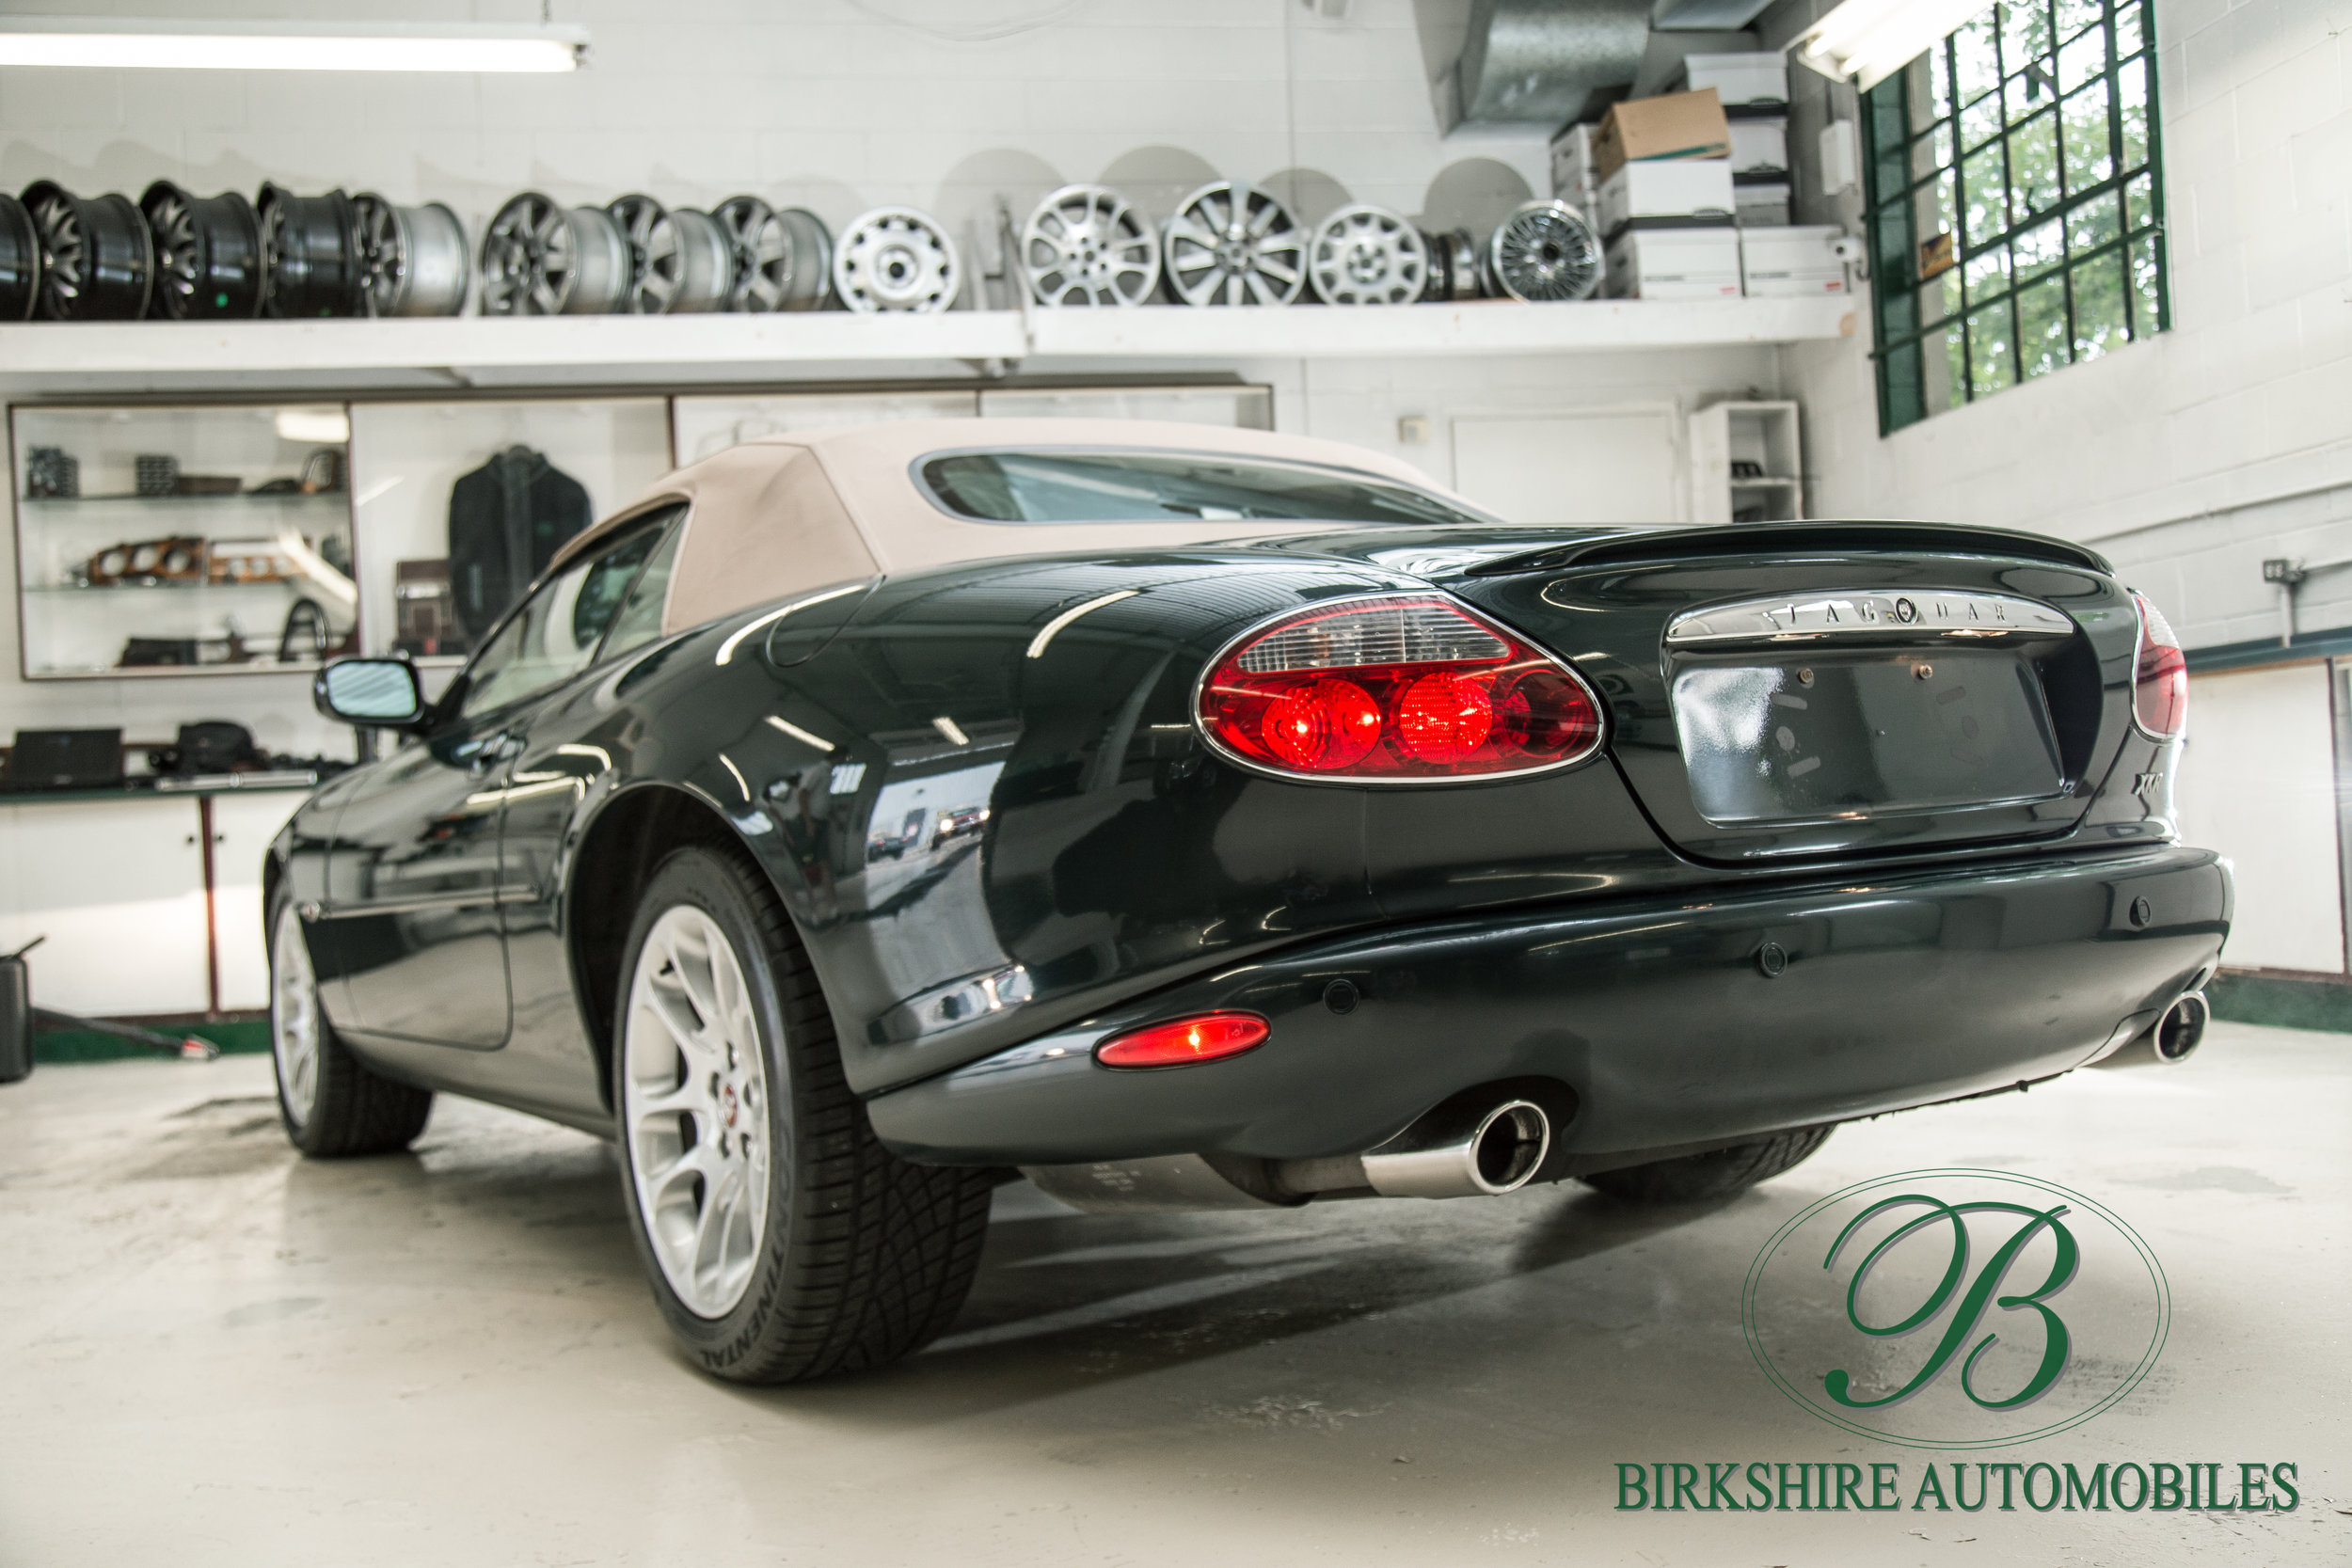 Birkshire Automobiles-2001 Jaguar XKR Convertible (7).jpg